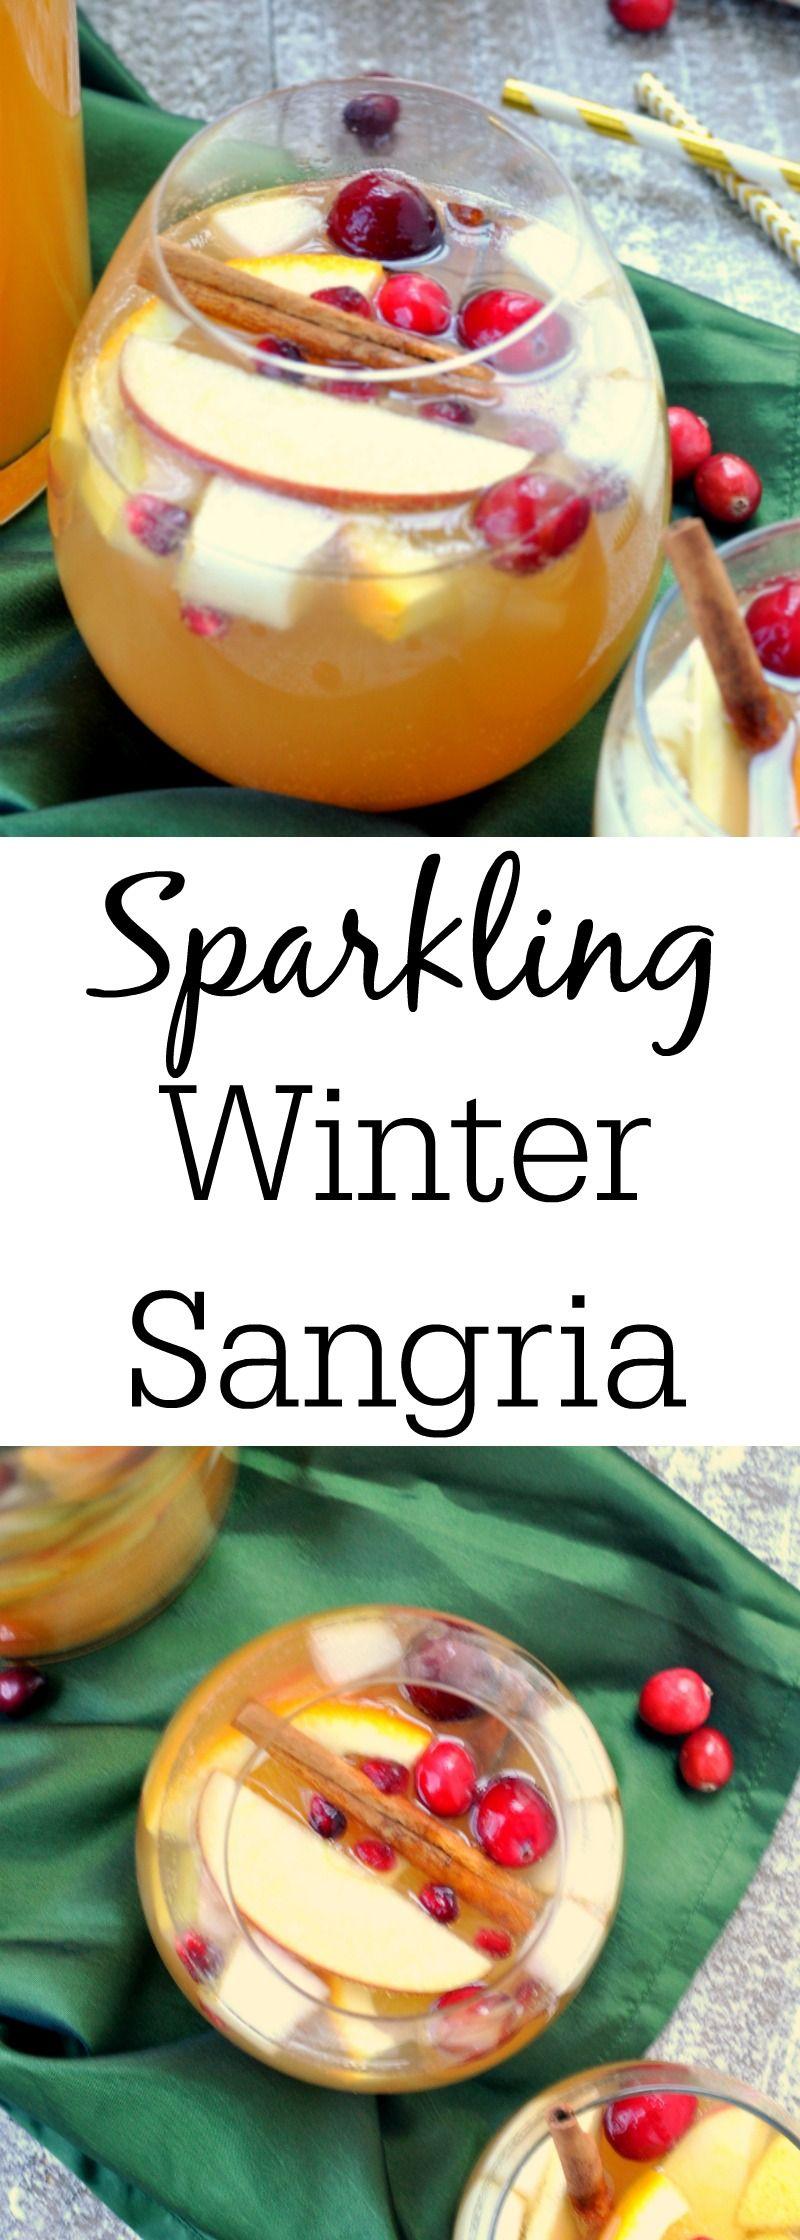 Watch Sparkling Winter Sangria video